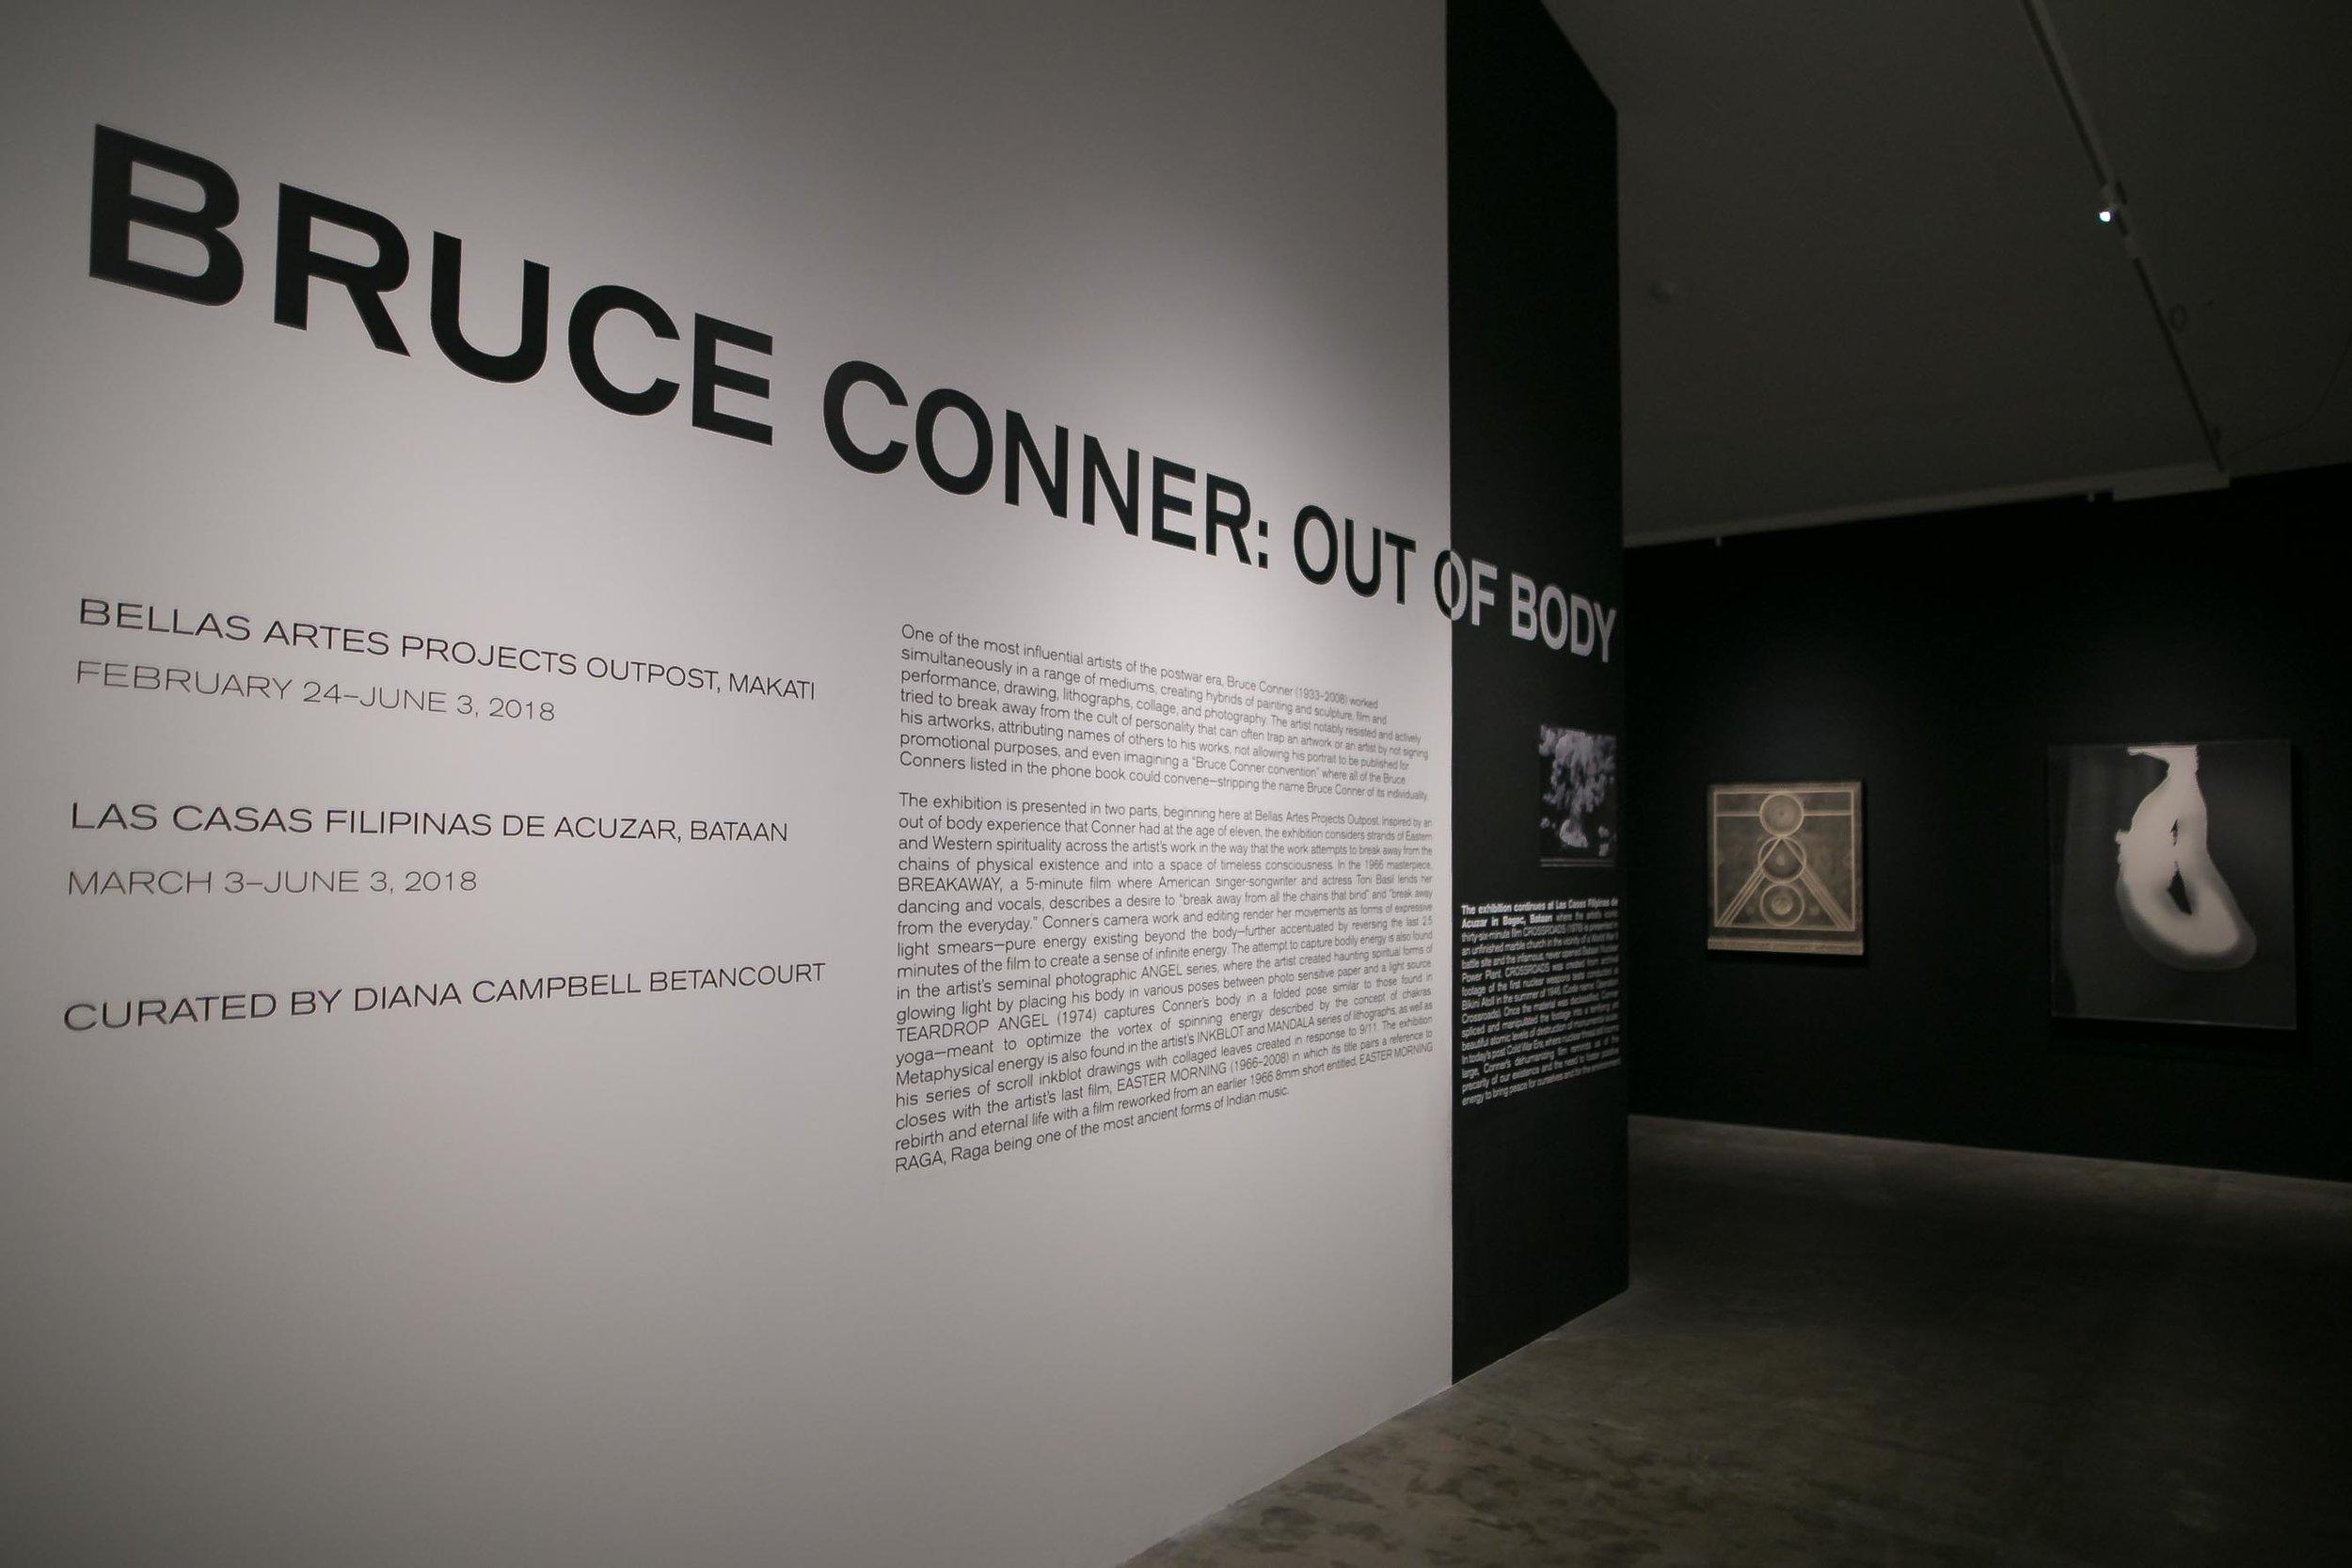 Bruce Conner_BAP Outpost Installation_WallIntro_PhotobyToiaAvenido.jpg